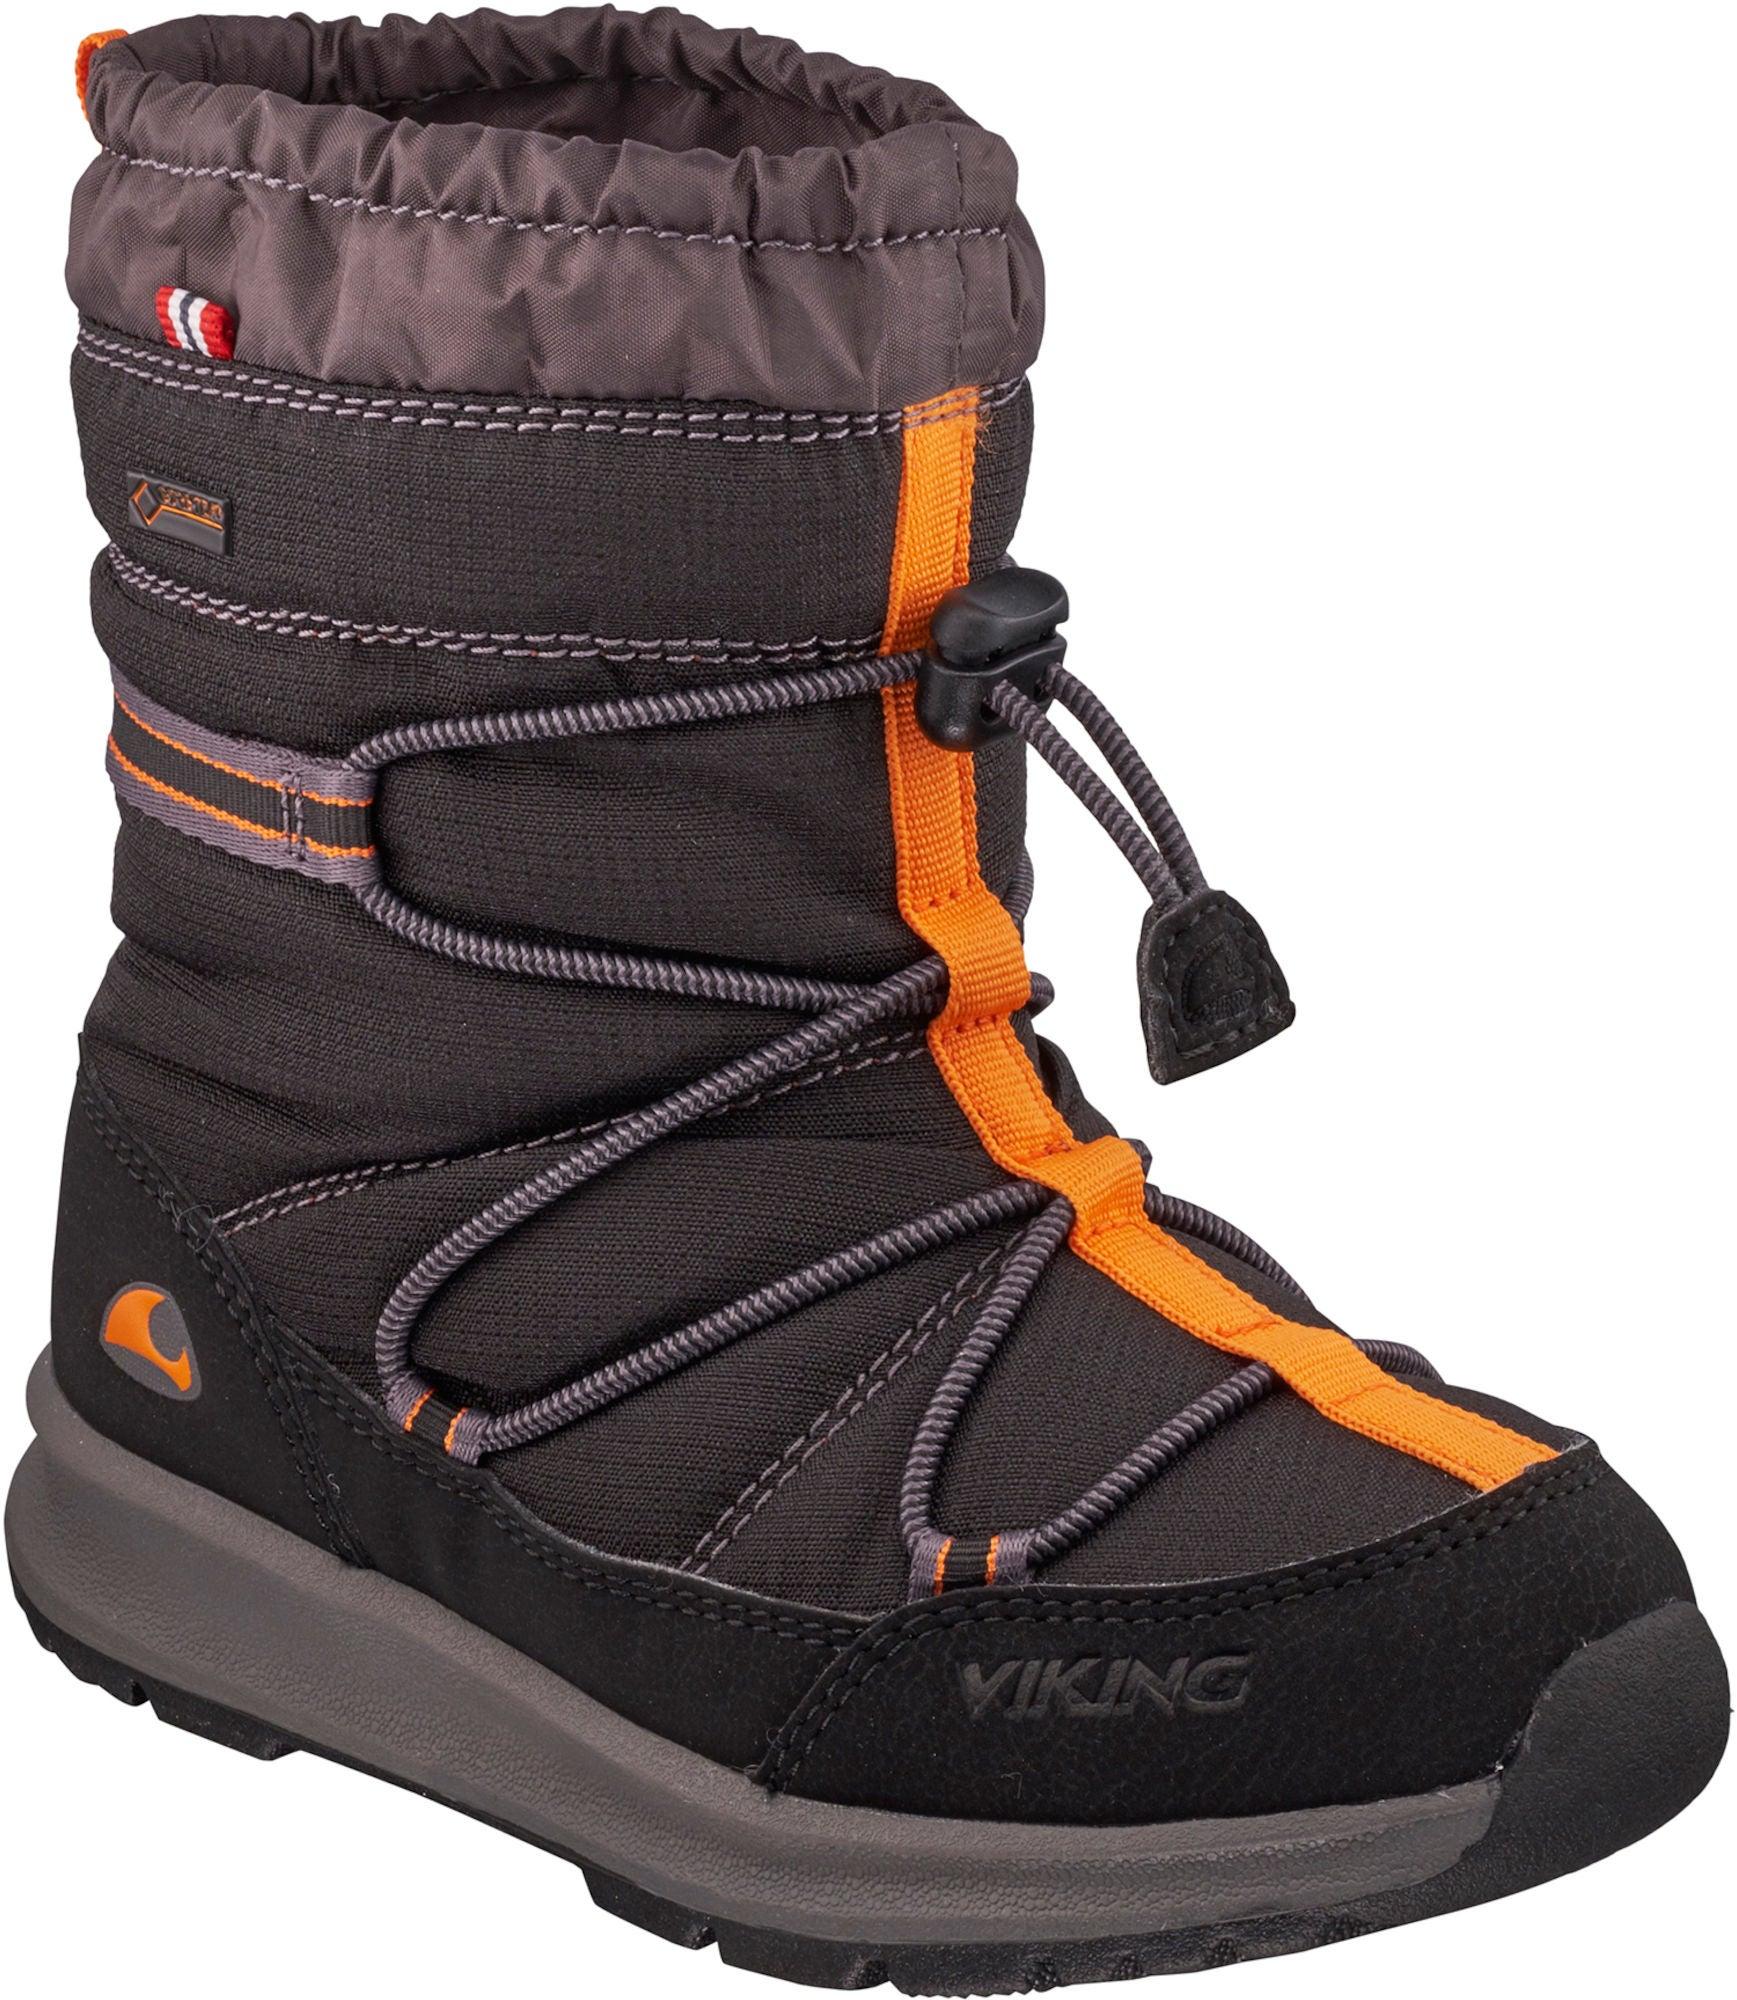 Viking Asak GTX Känga, BlackRust 30 Viking Footwear